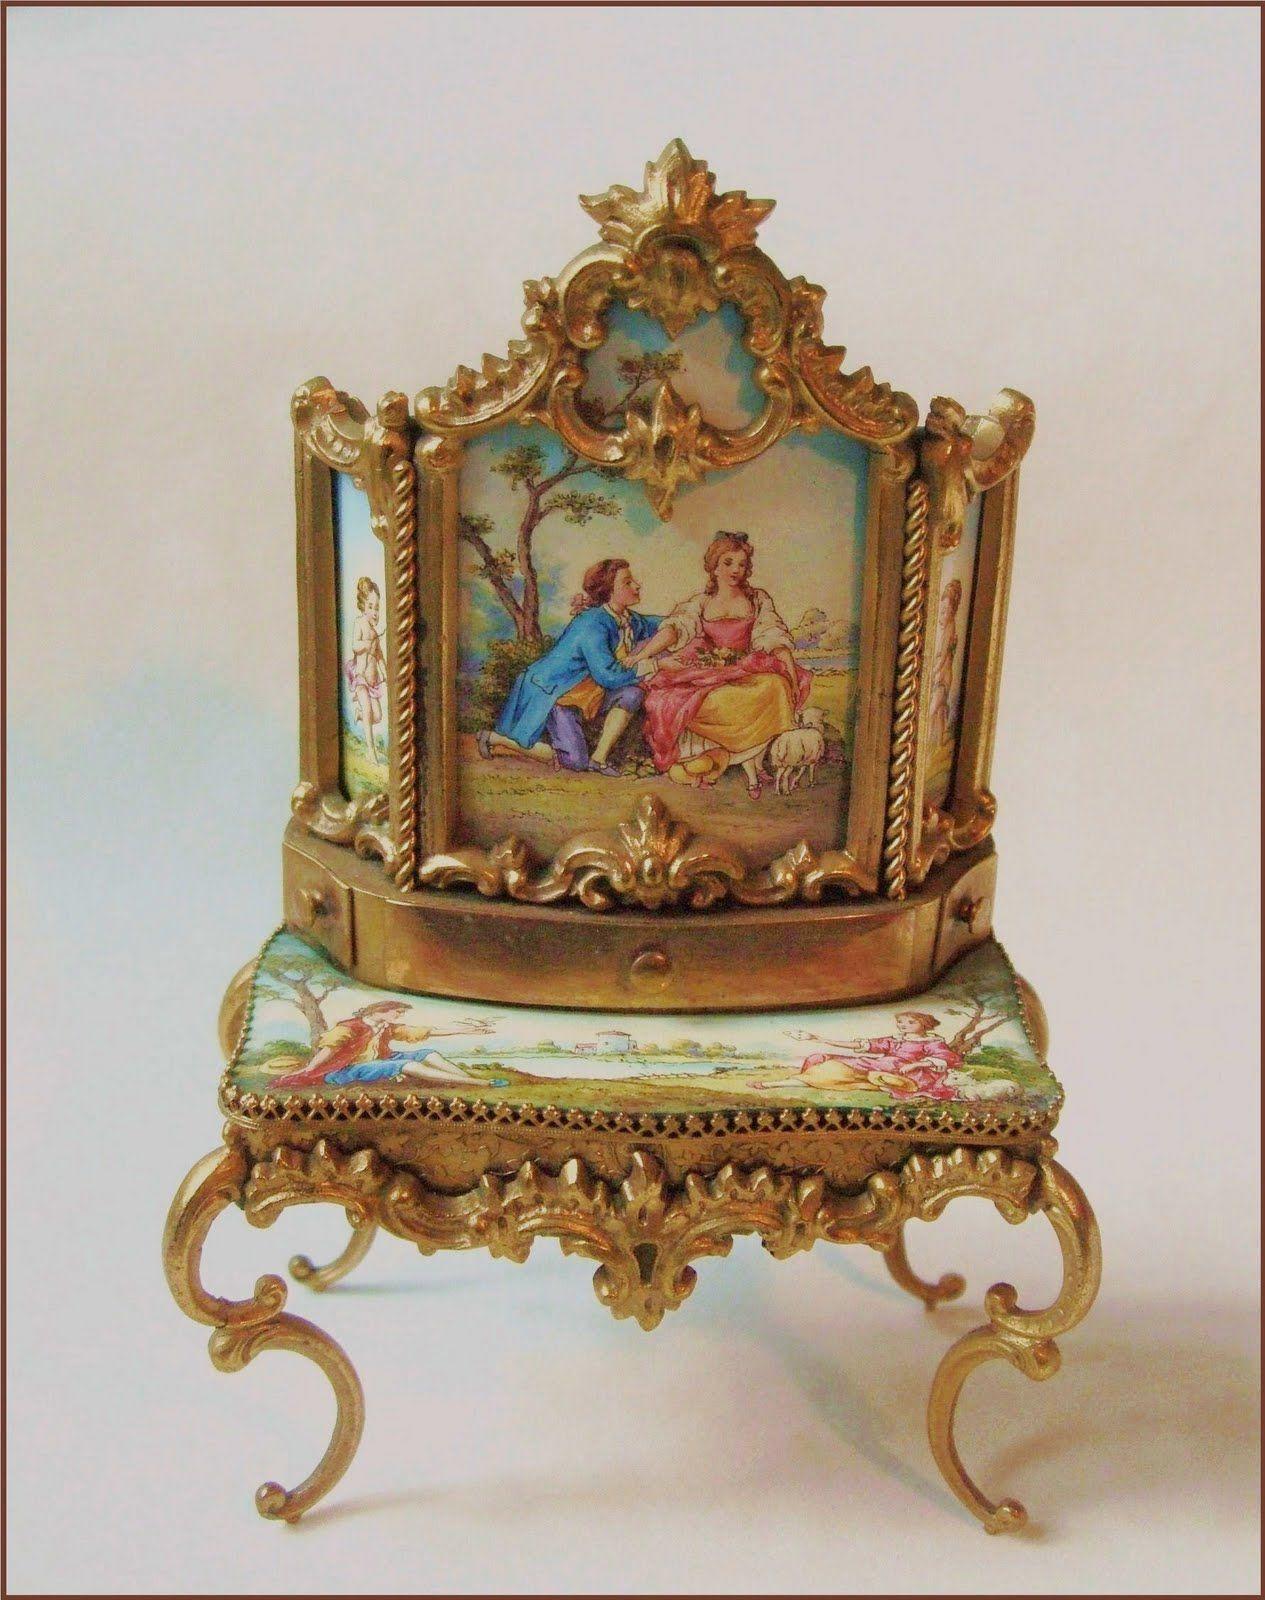 made in Austria circa 1890 presumable by Erhard & Söhne